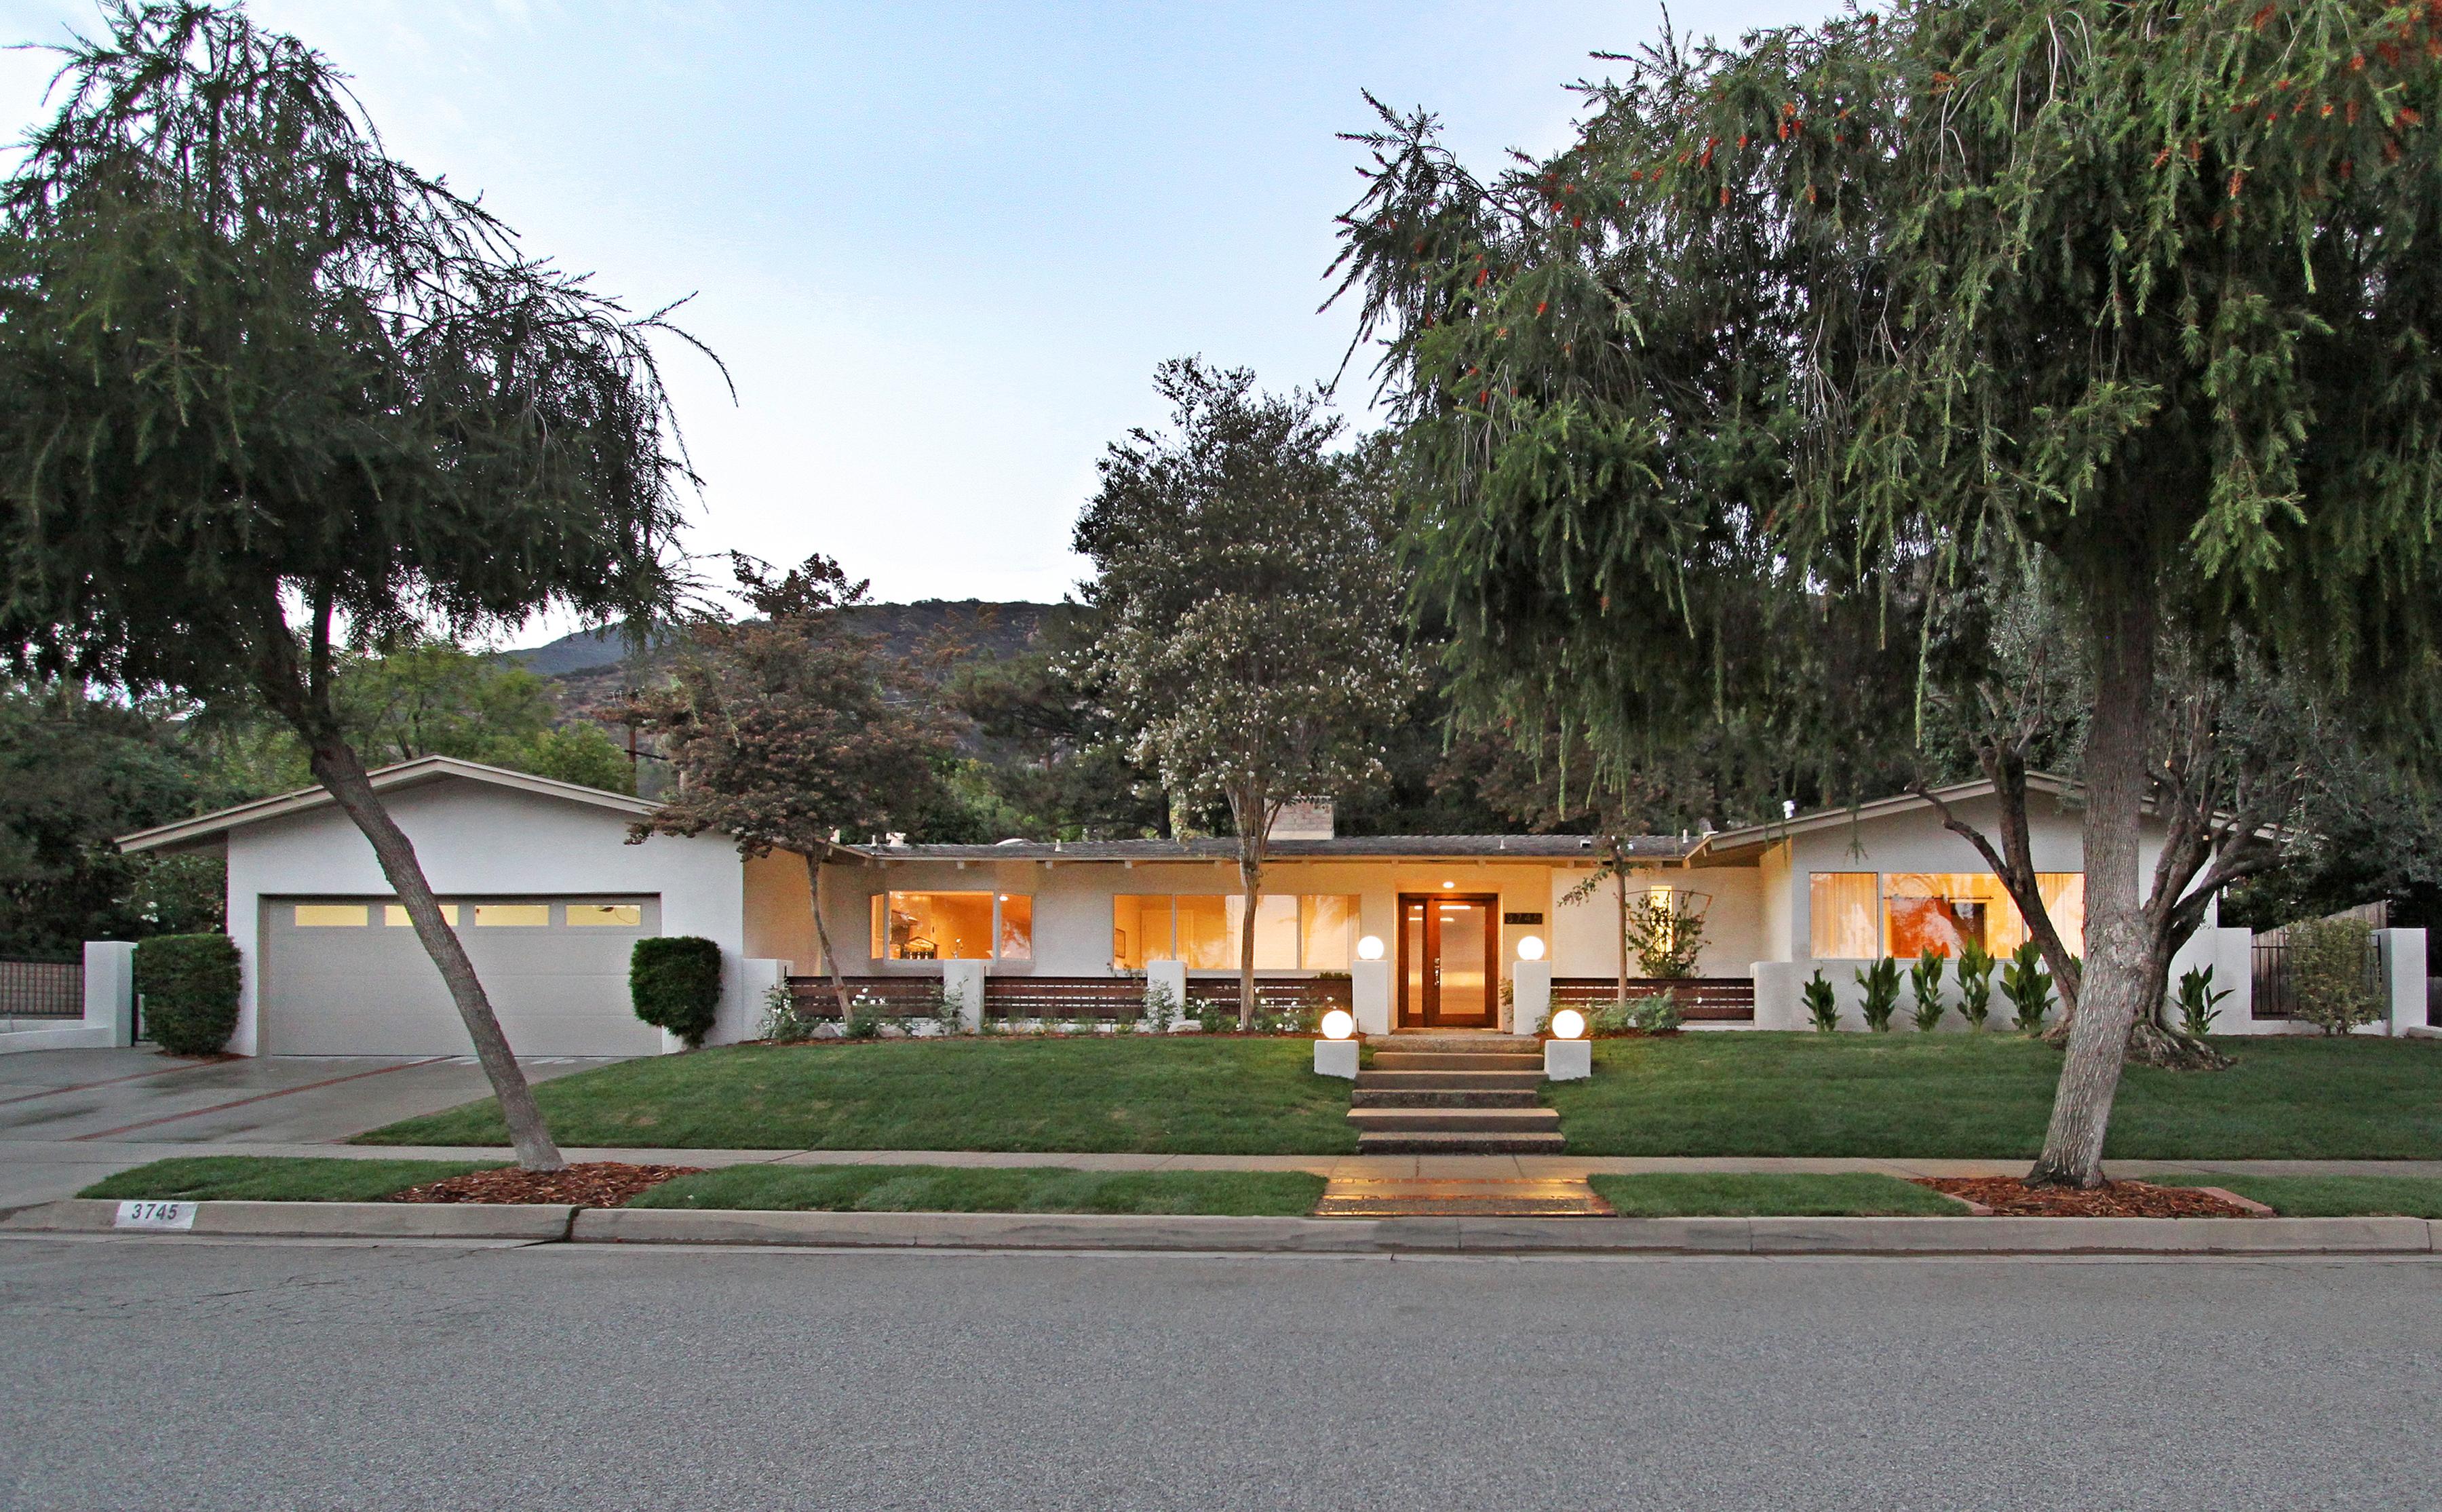 3745 Ranch Top Rd, Pasadena 91107